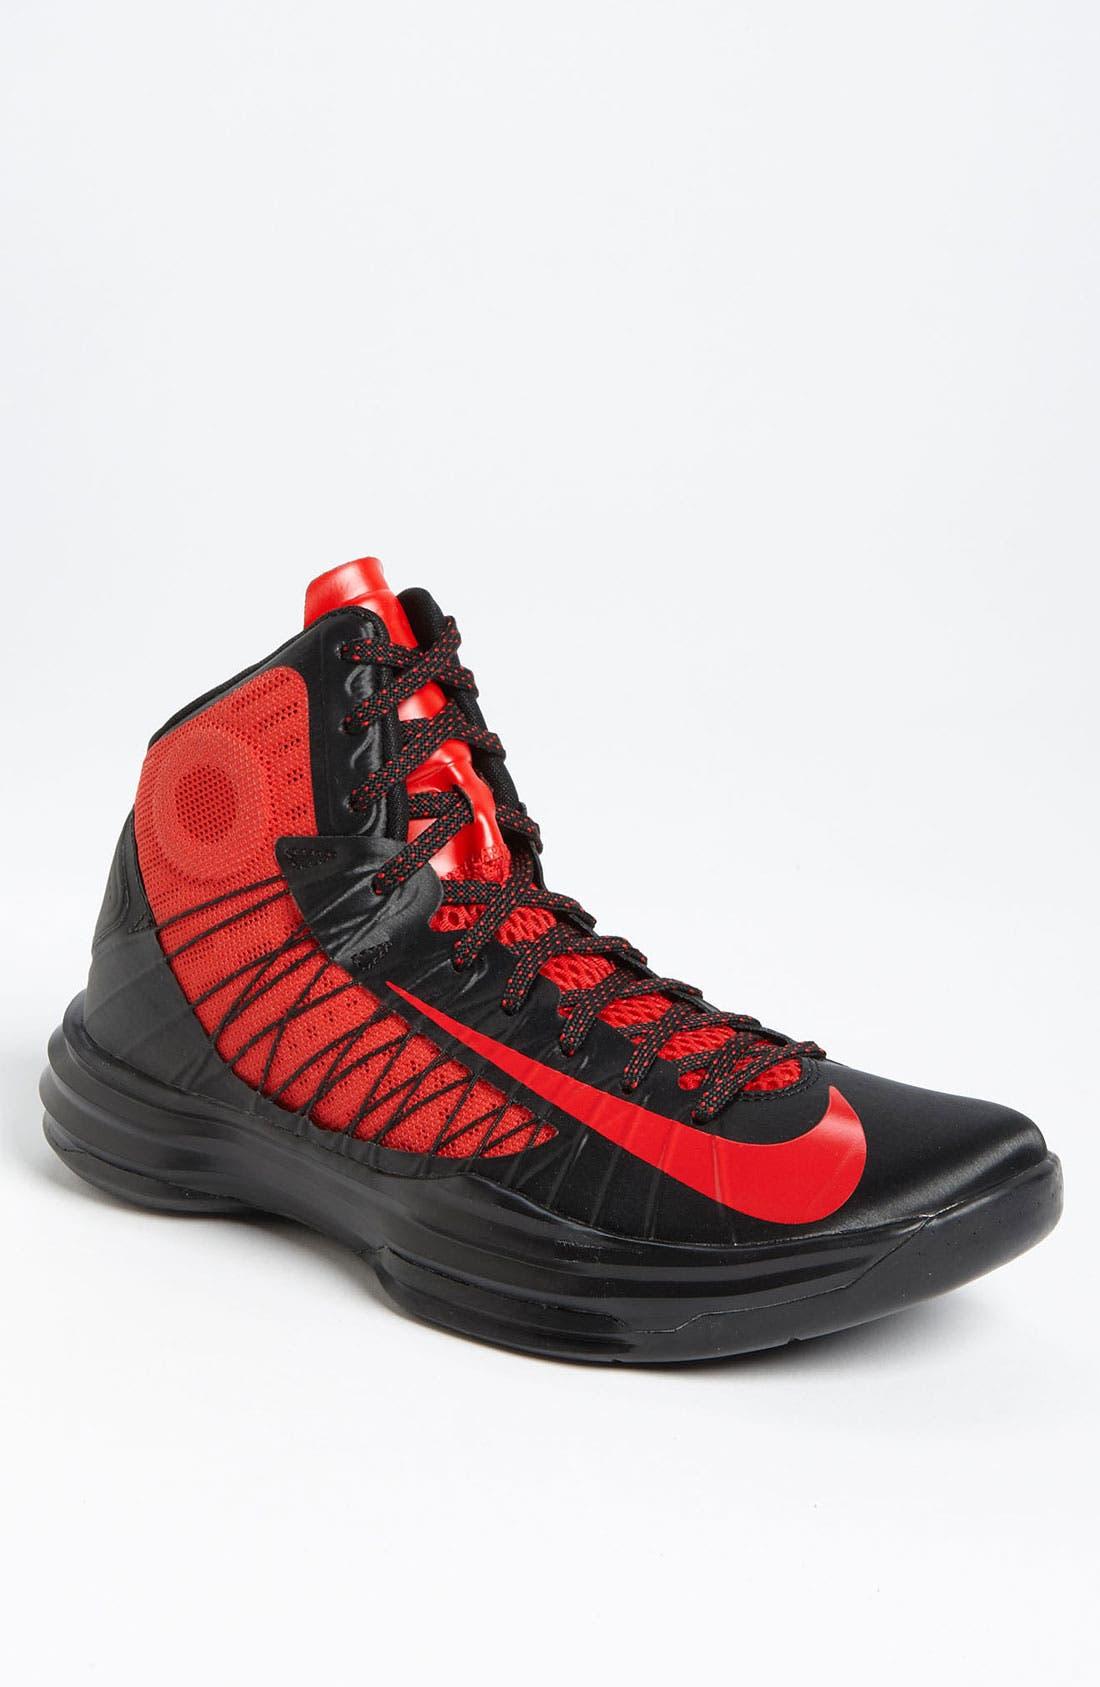 Main Image - Nike 'Hyperdunk' Basketball Shoe (Men) (Online Only)